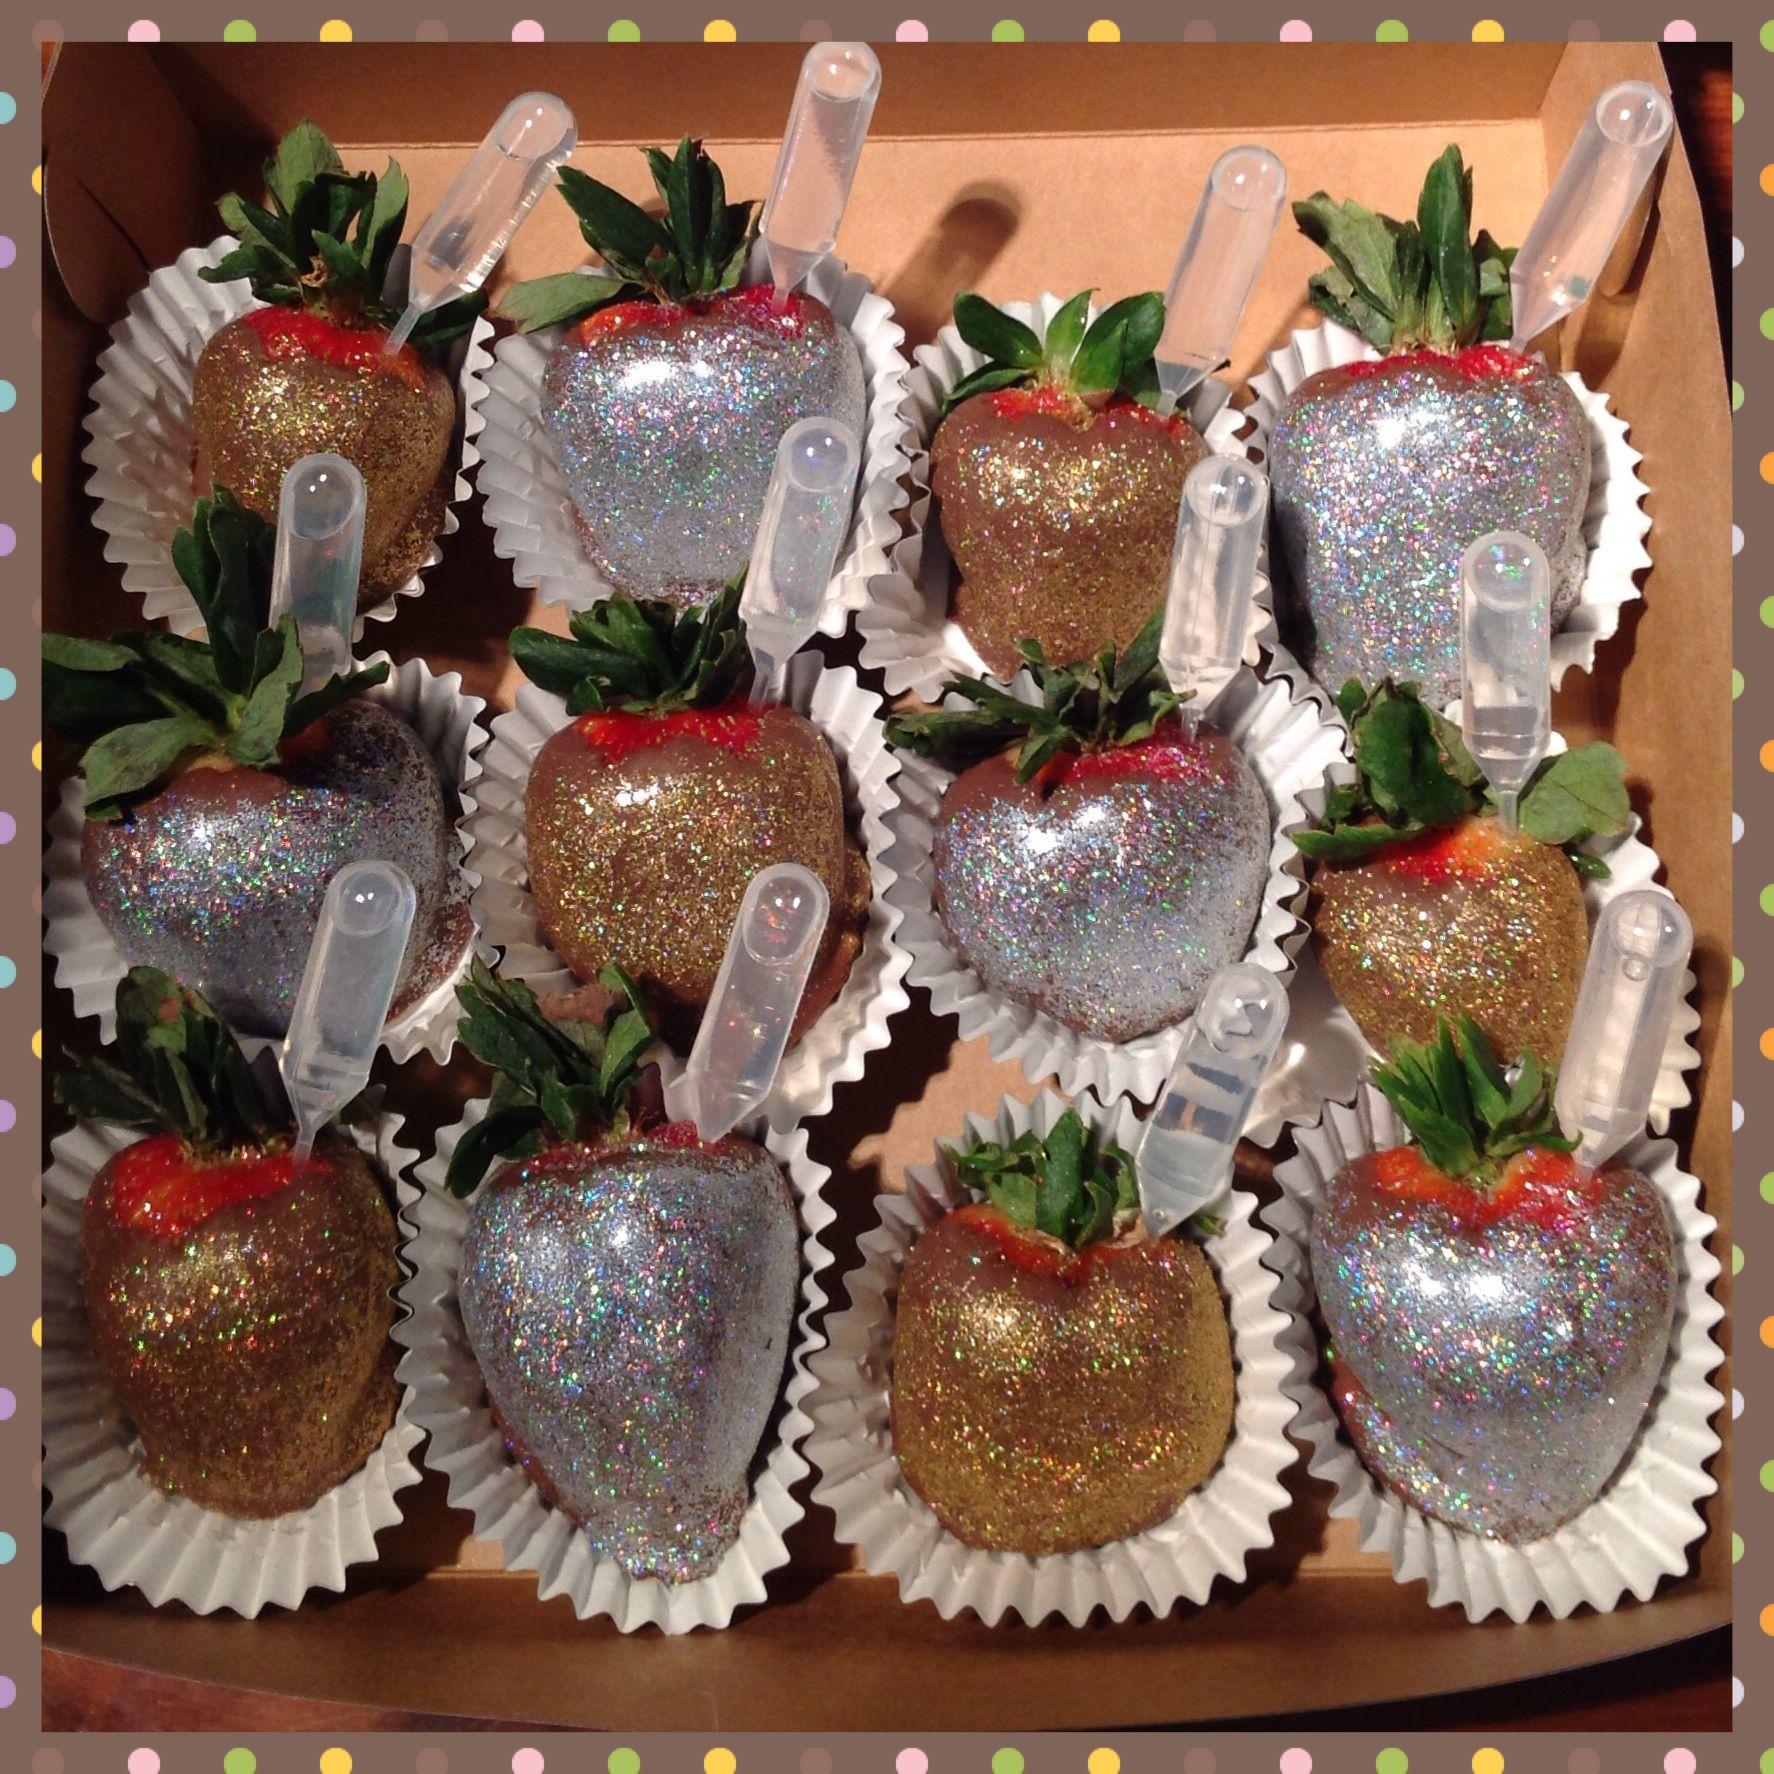 Image result for drunken strawberries recipe wine tasting image result for drunken strawberries recipe forumfinder Gallery